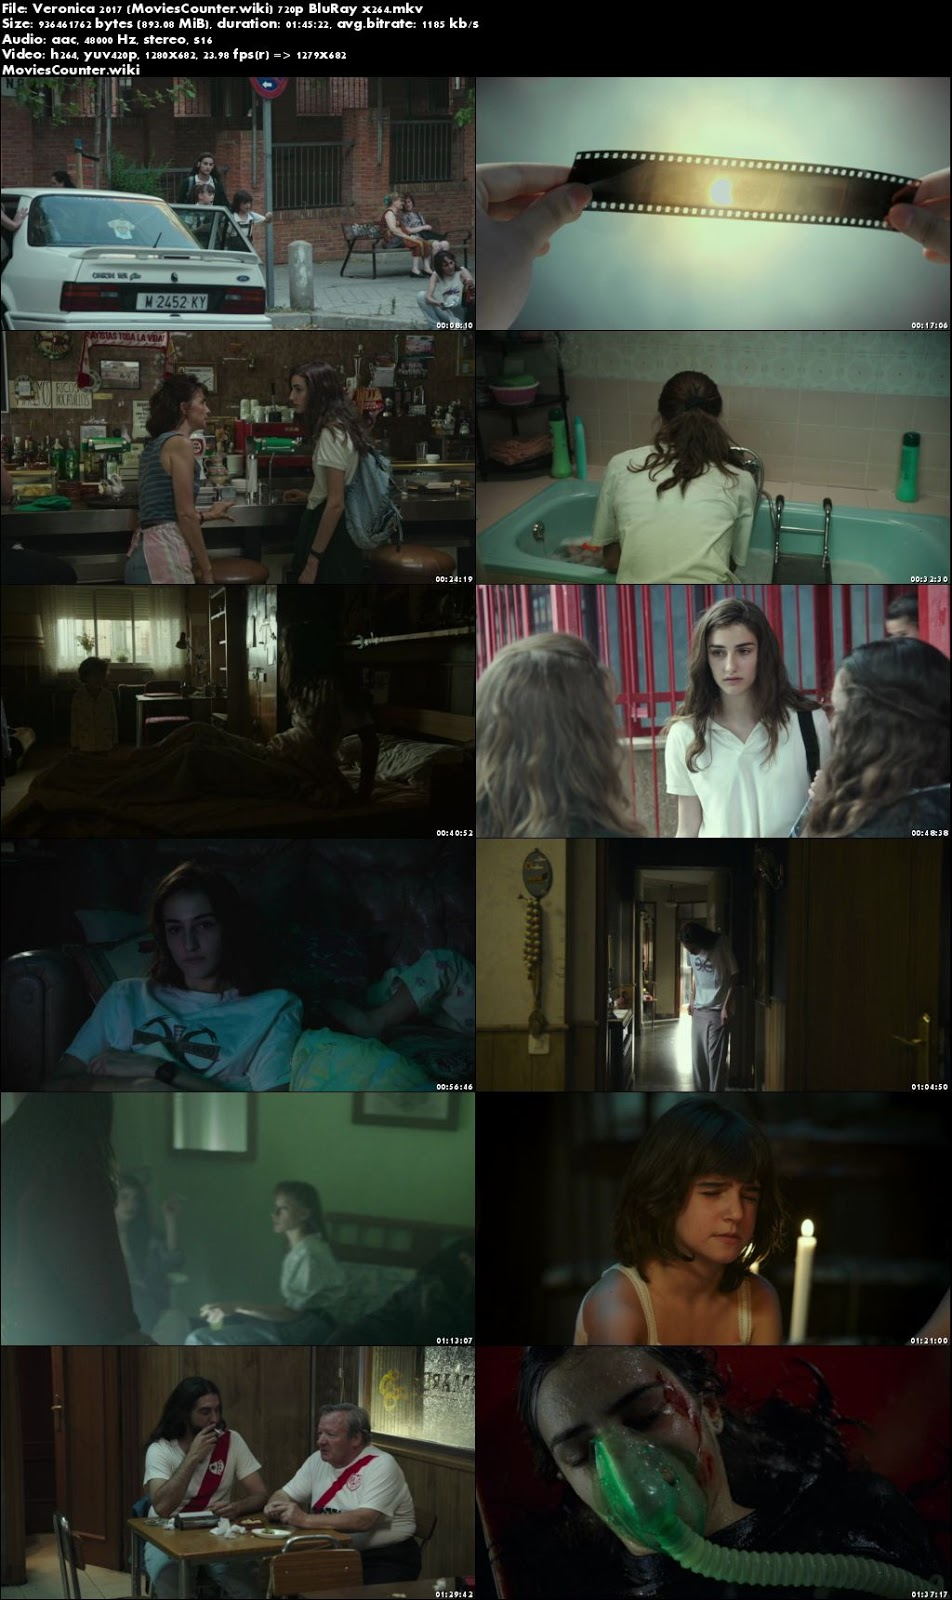 Screen Shots Veronica 2017 Spanish HD 720p